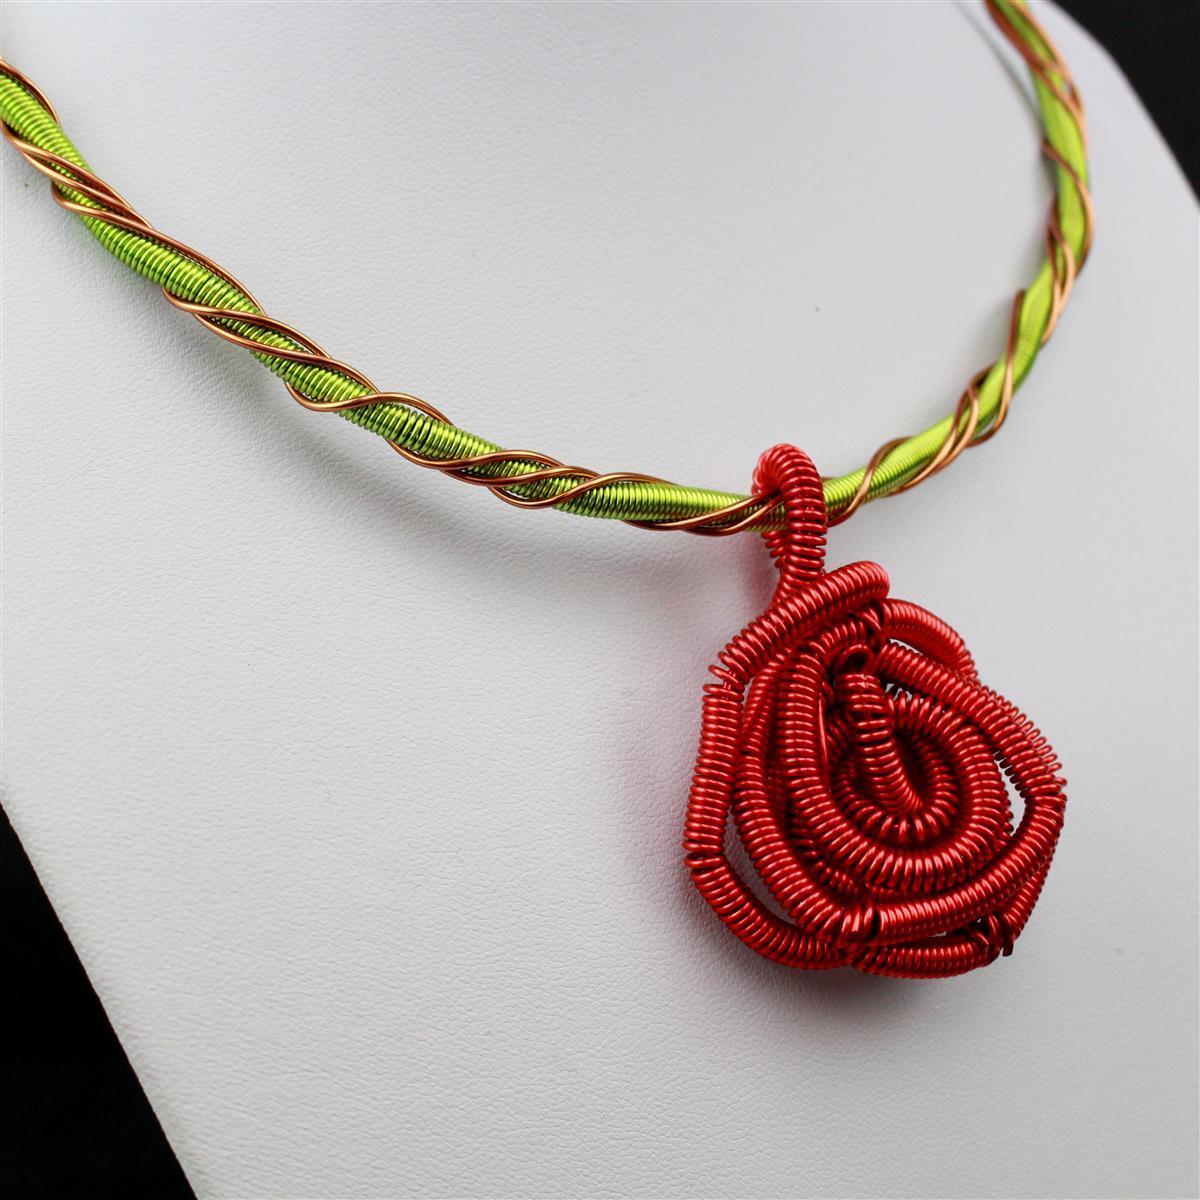 Copper Wire Bundle : Wirework clearance bundle m copper wire with purple